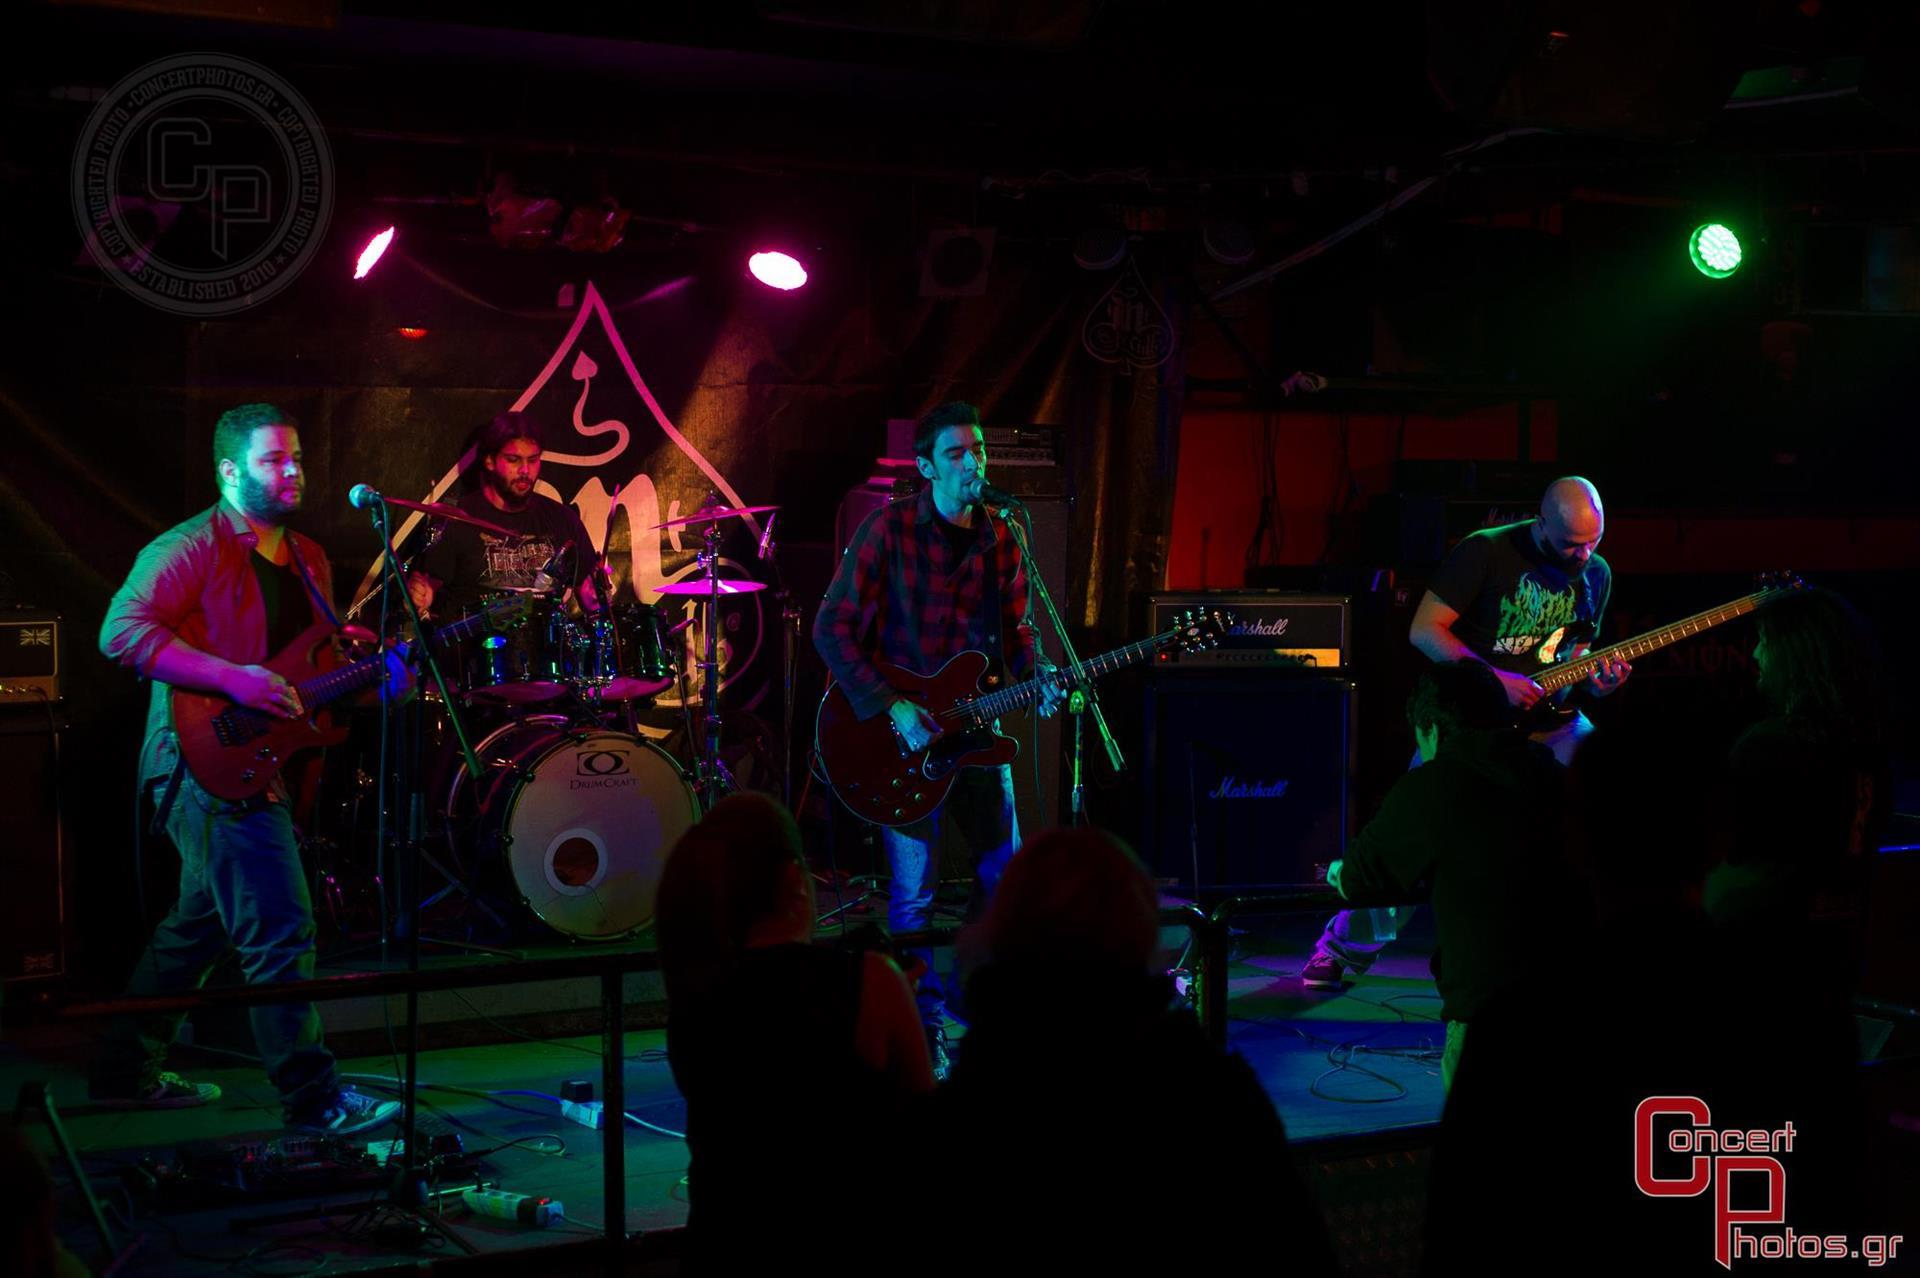 Battle Of The Bands Athens - Leg 3- photographer:  - ConcertPhotos - 20150105_0013_17